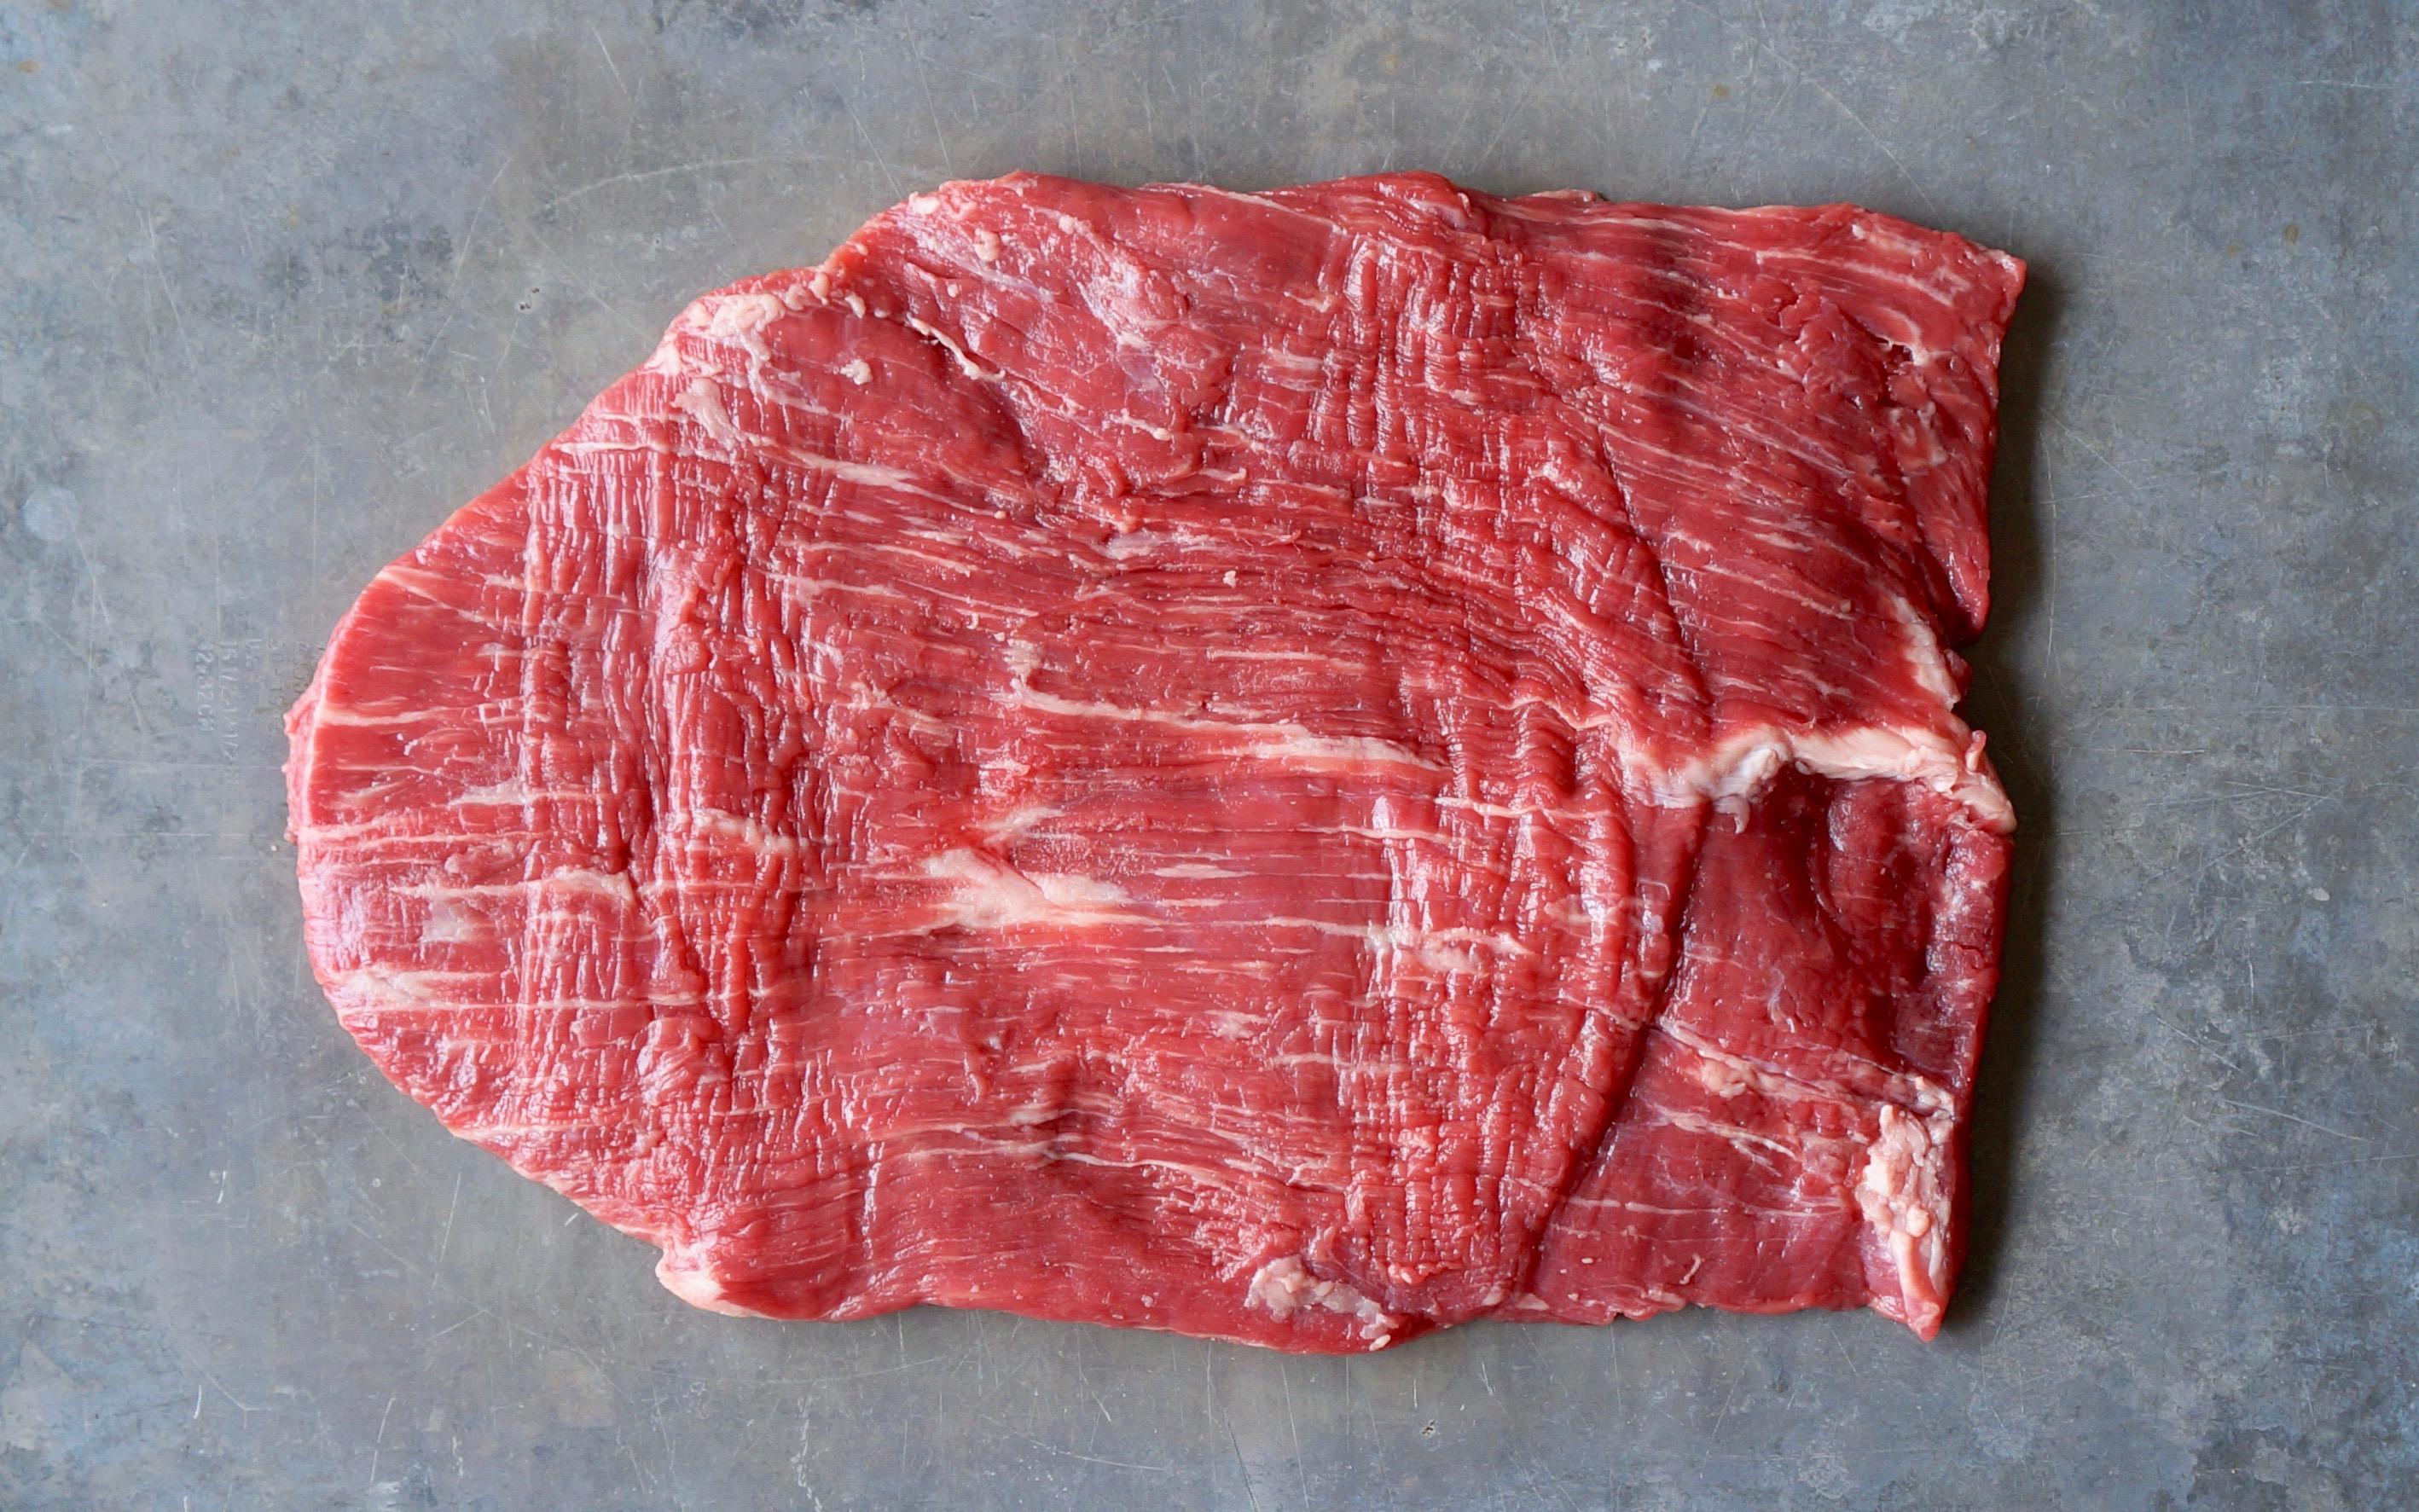 Flank-Steak-Rebecca-Gordon-Editor-In-Chief-Buttermilk-Lipstick-Culinary-Entertaining-Techniques-Southern-Hostess-RebeccaGordon-Pastry-Chef-Buttermilk-Lipstick-RebeccaGordon-Pastry-Chef-Birmingham-Alabama